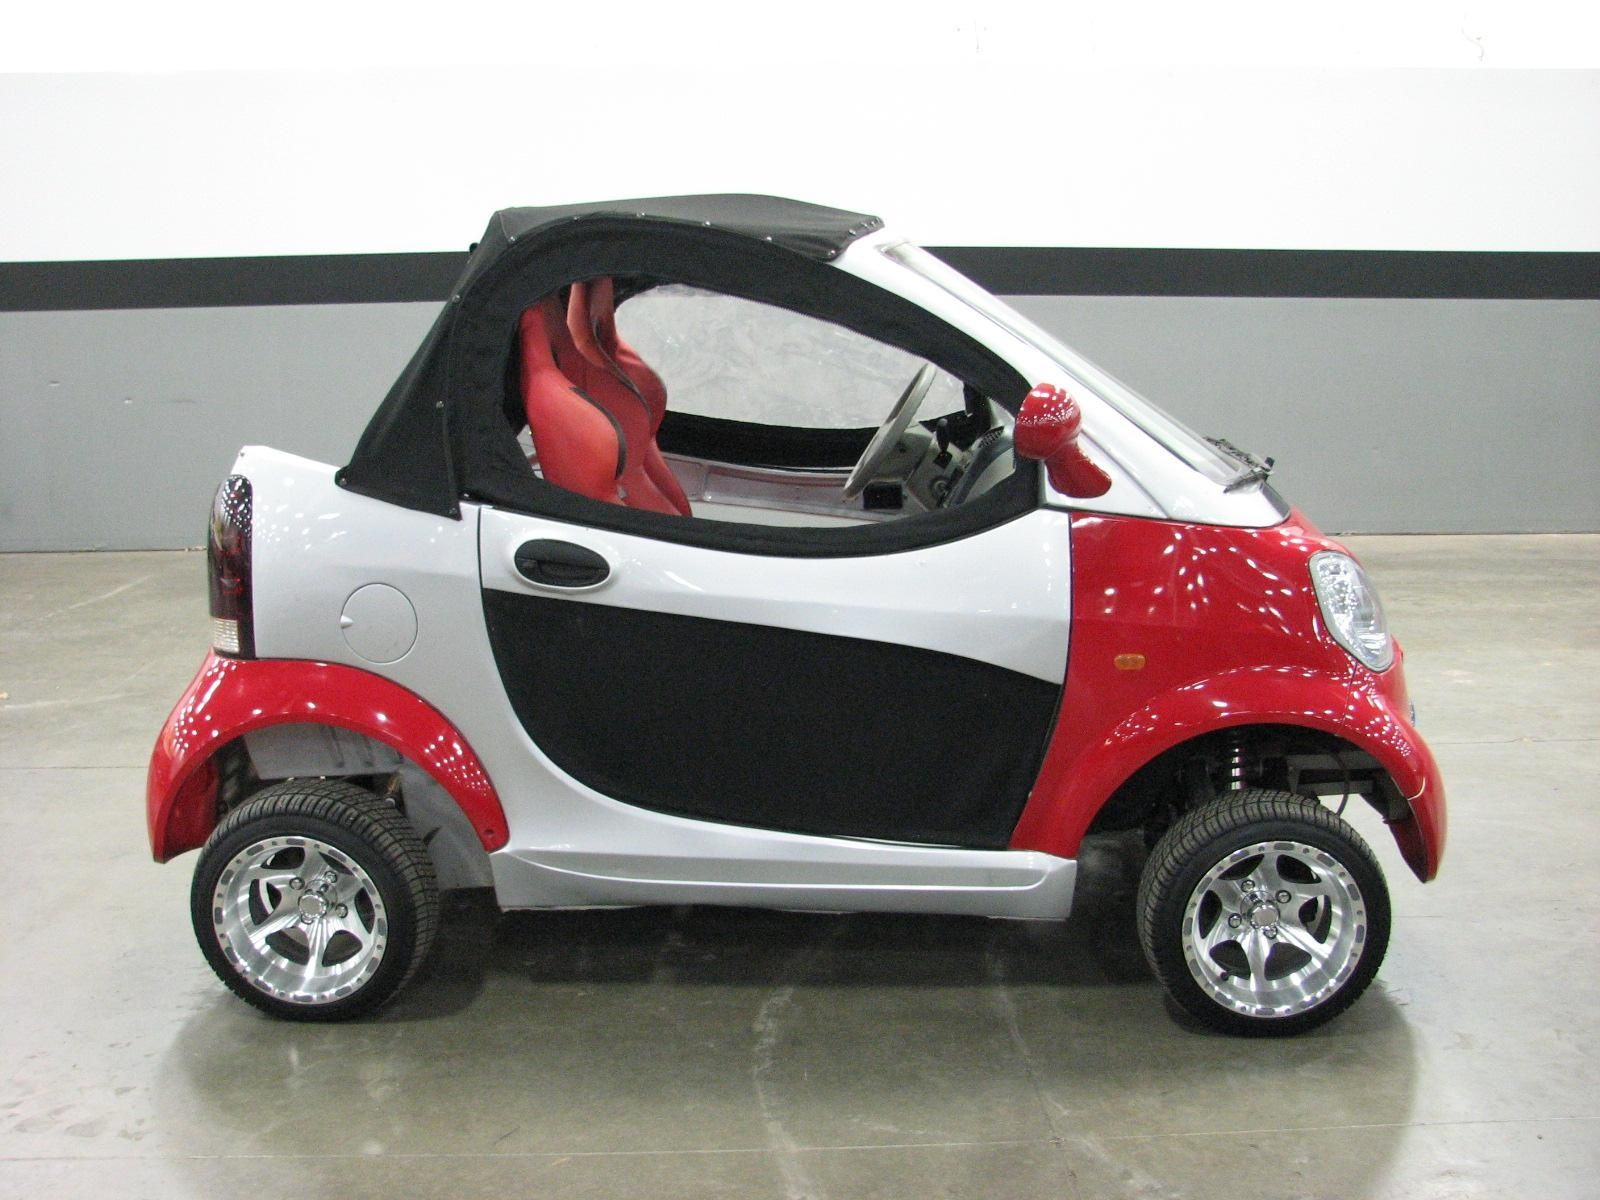 kandi electric car used 2008 10 11 2012 sale 13,000 OR